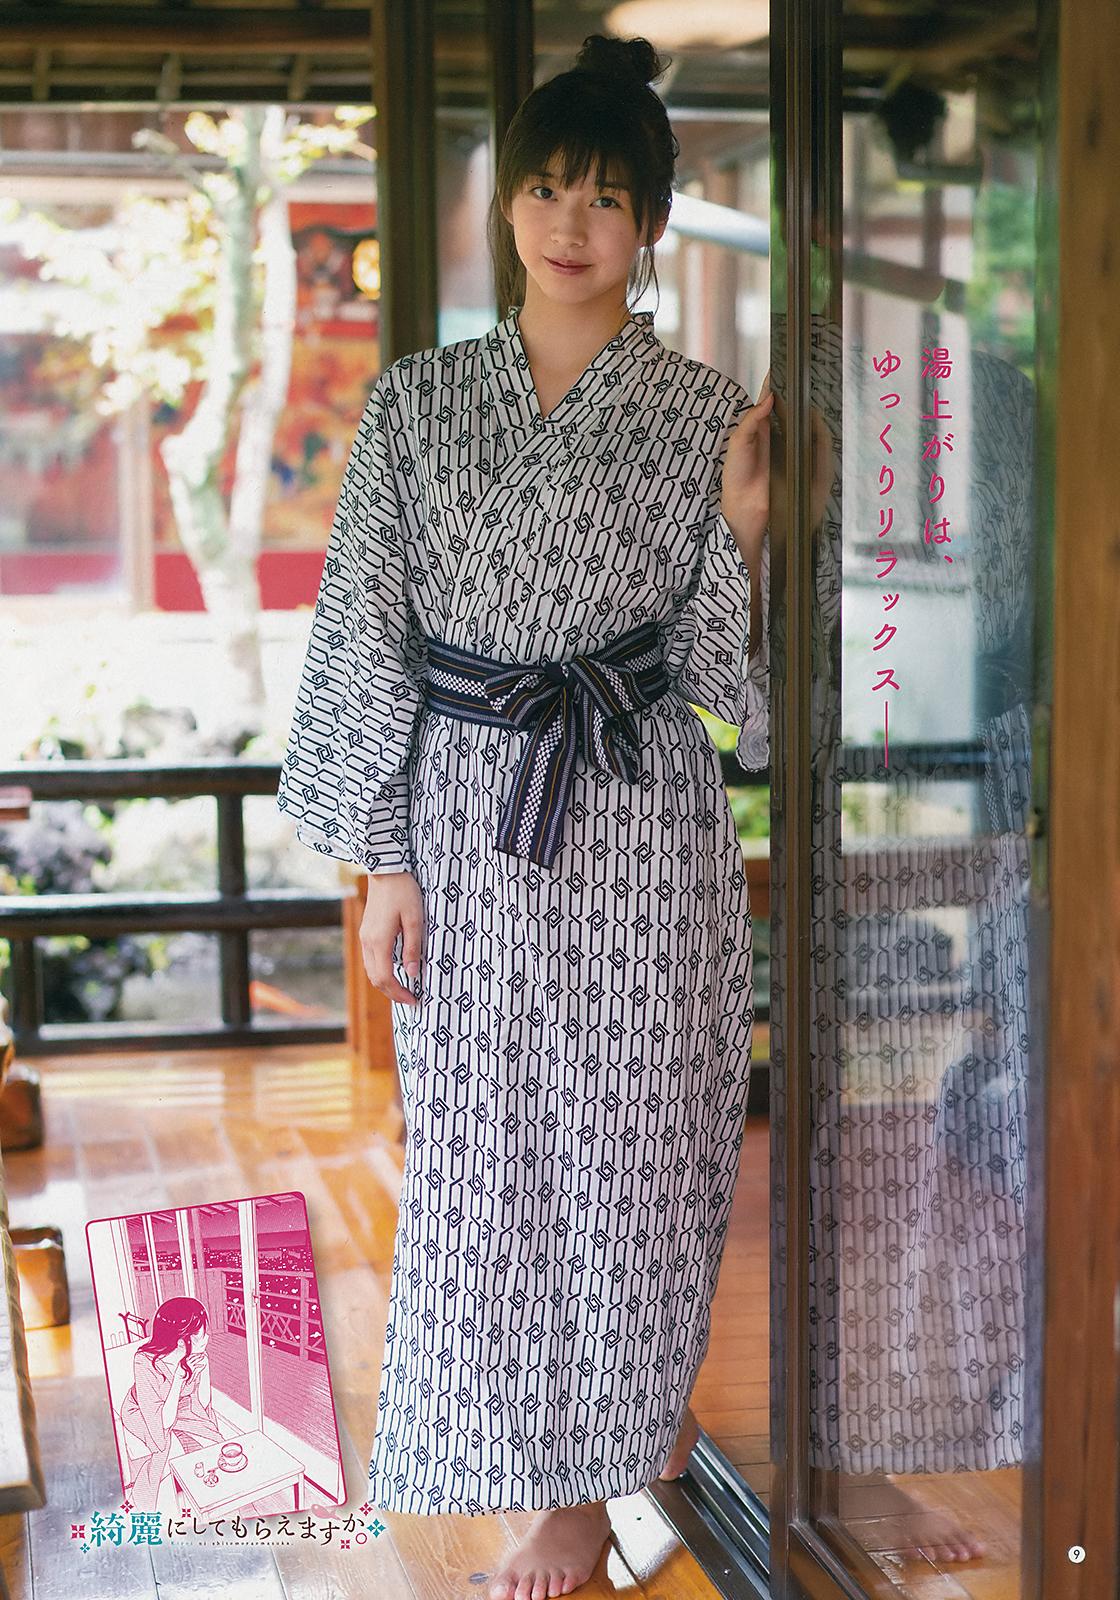 [Young Gangan] 2018 No.21 - Japanese Gravure Idol